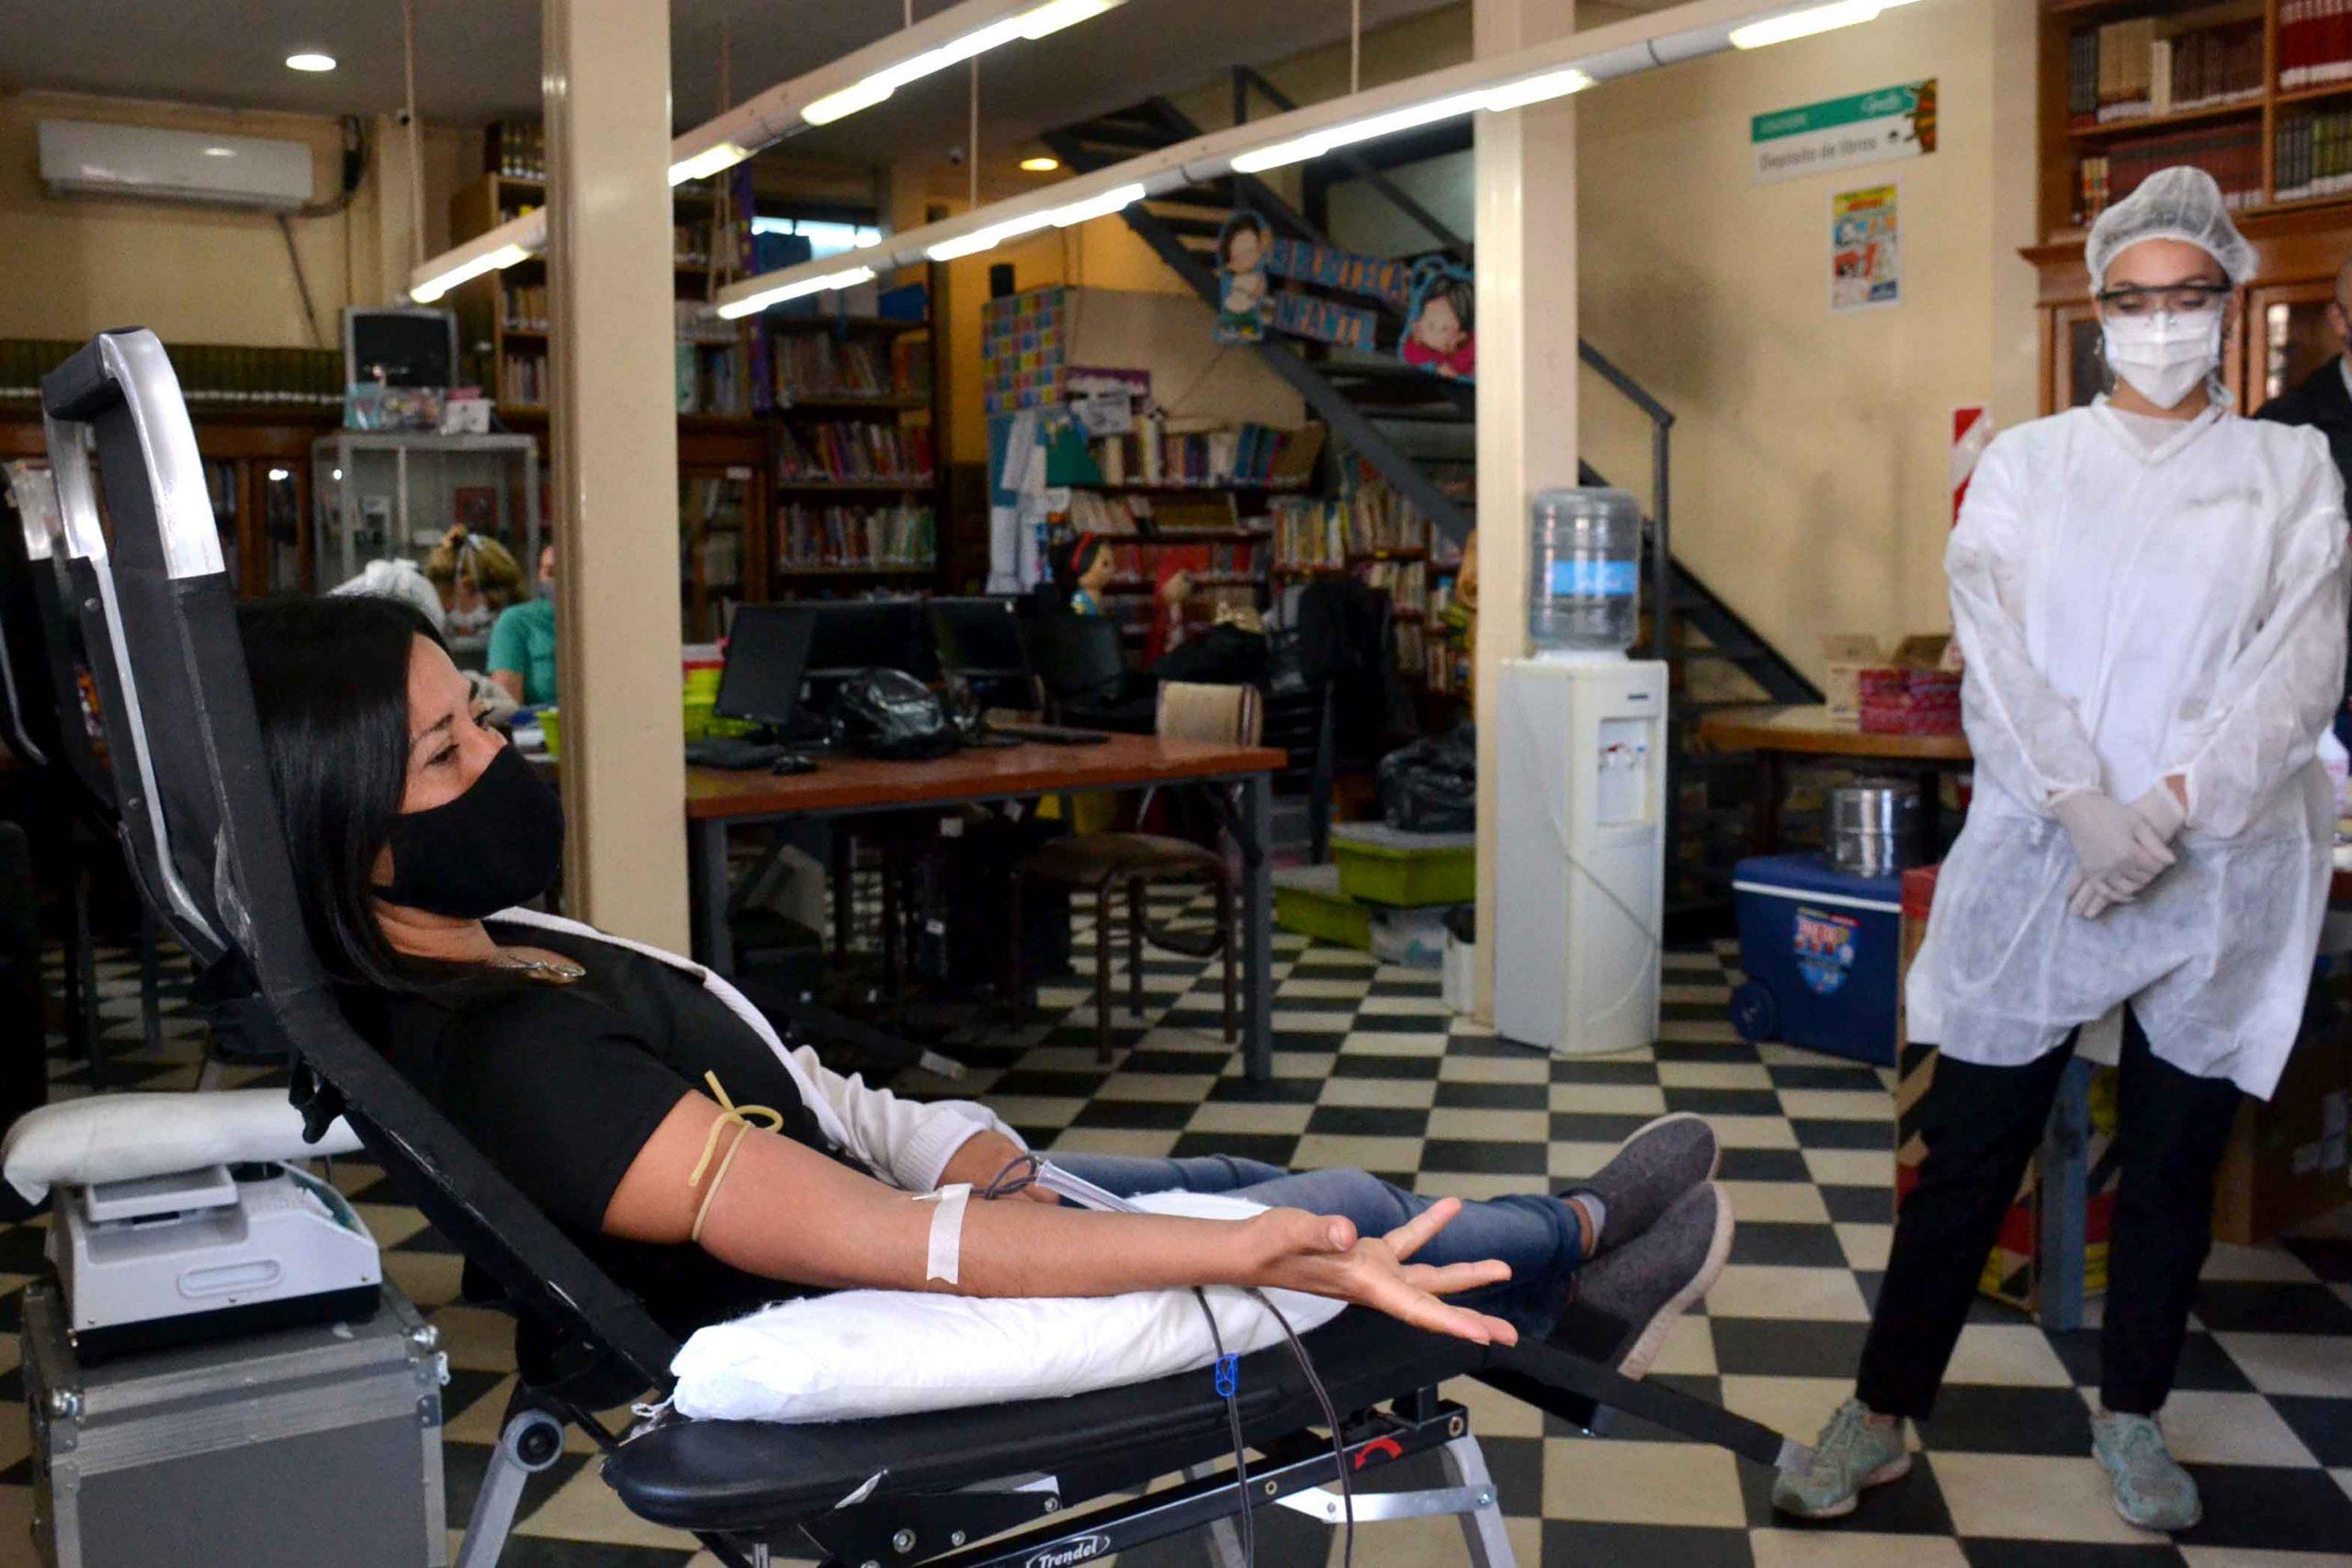 Donación de sangre -Biblioteca Almafuerte . (3)